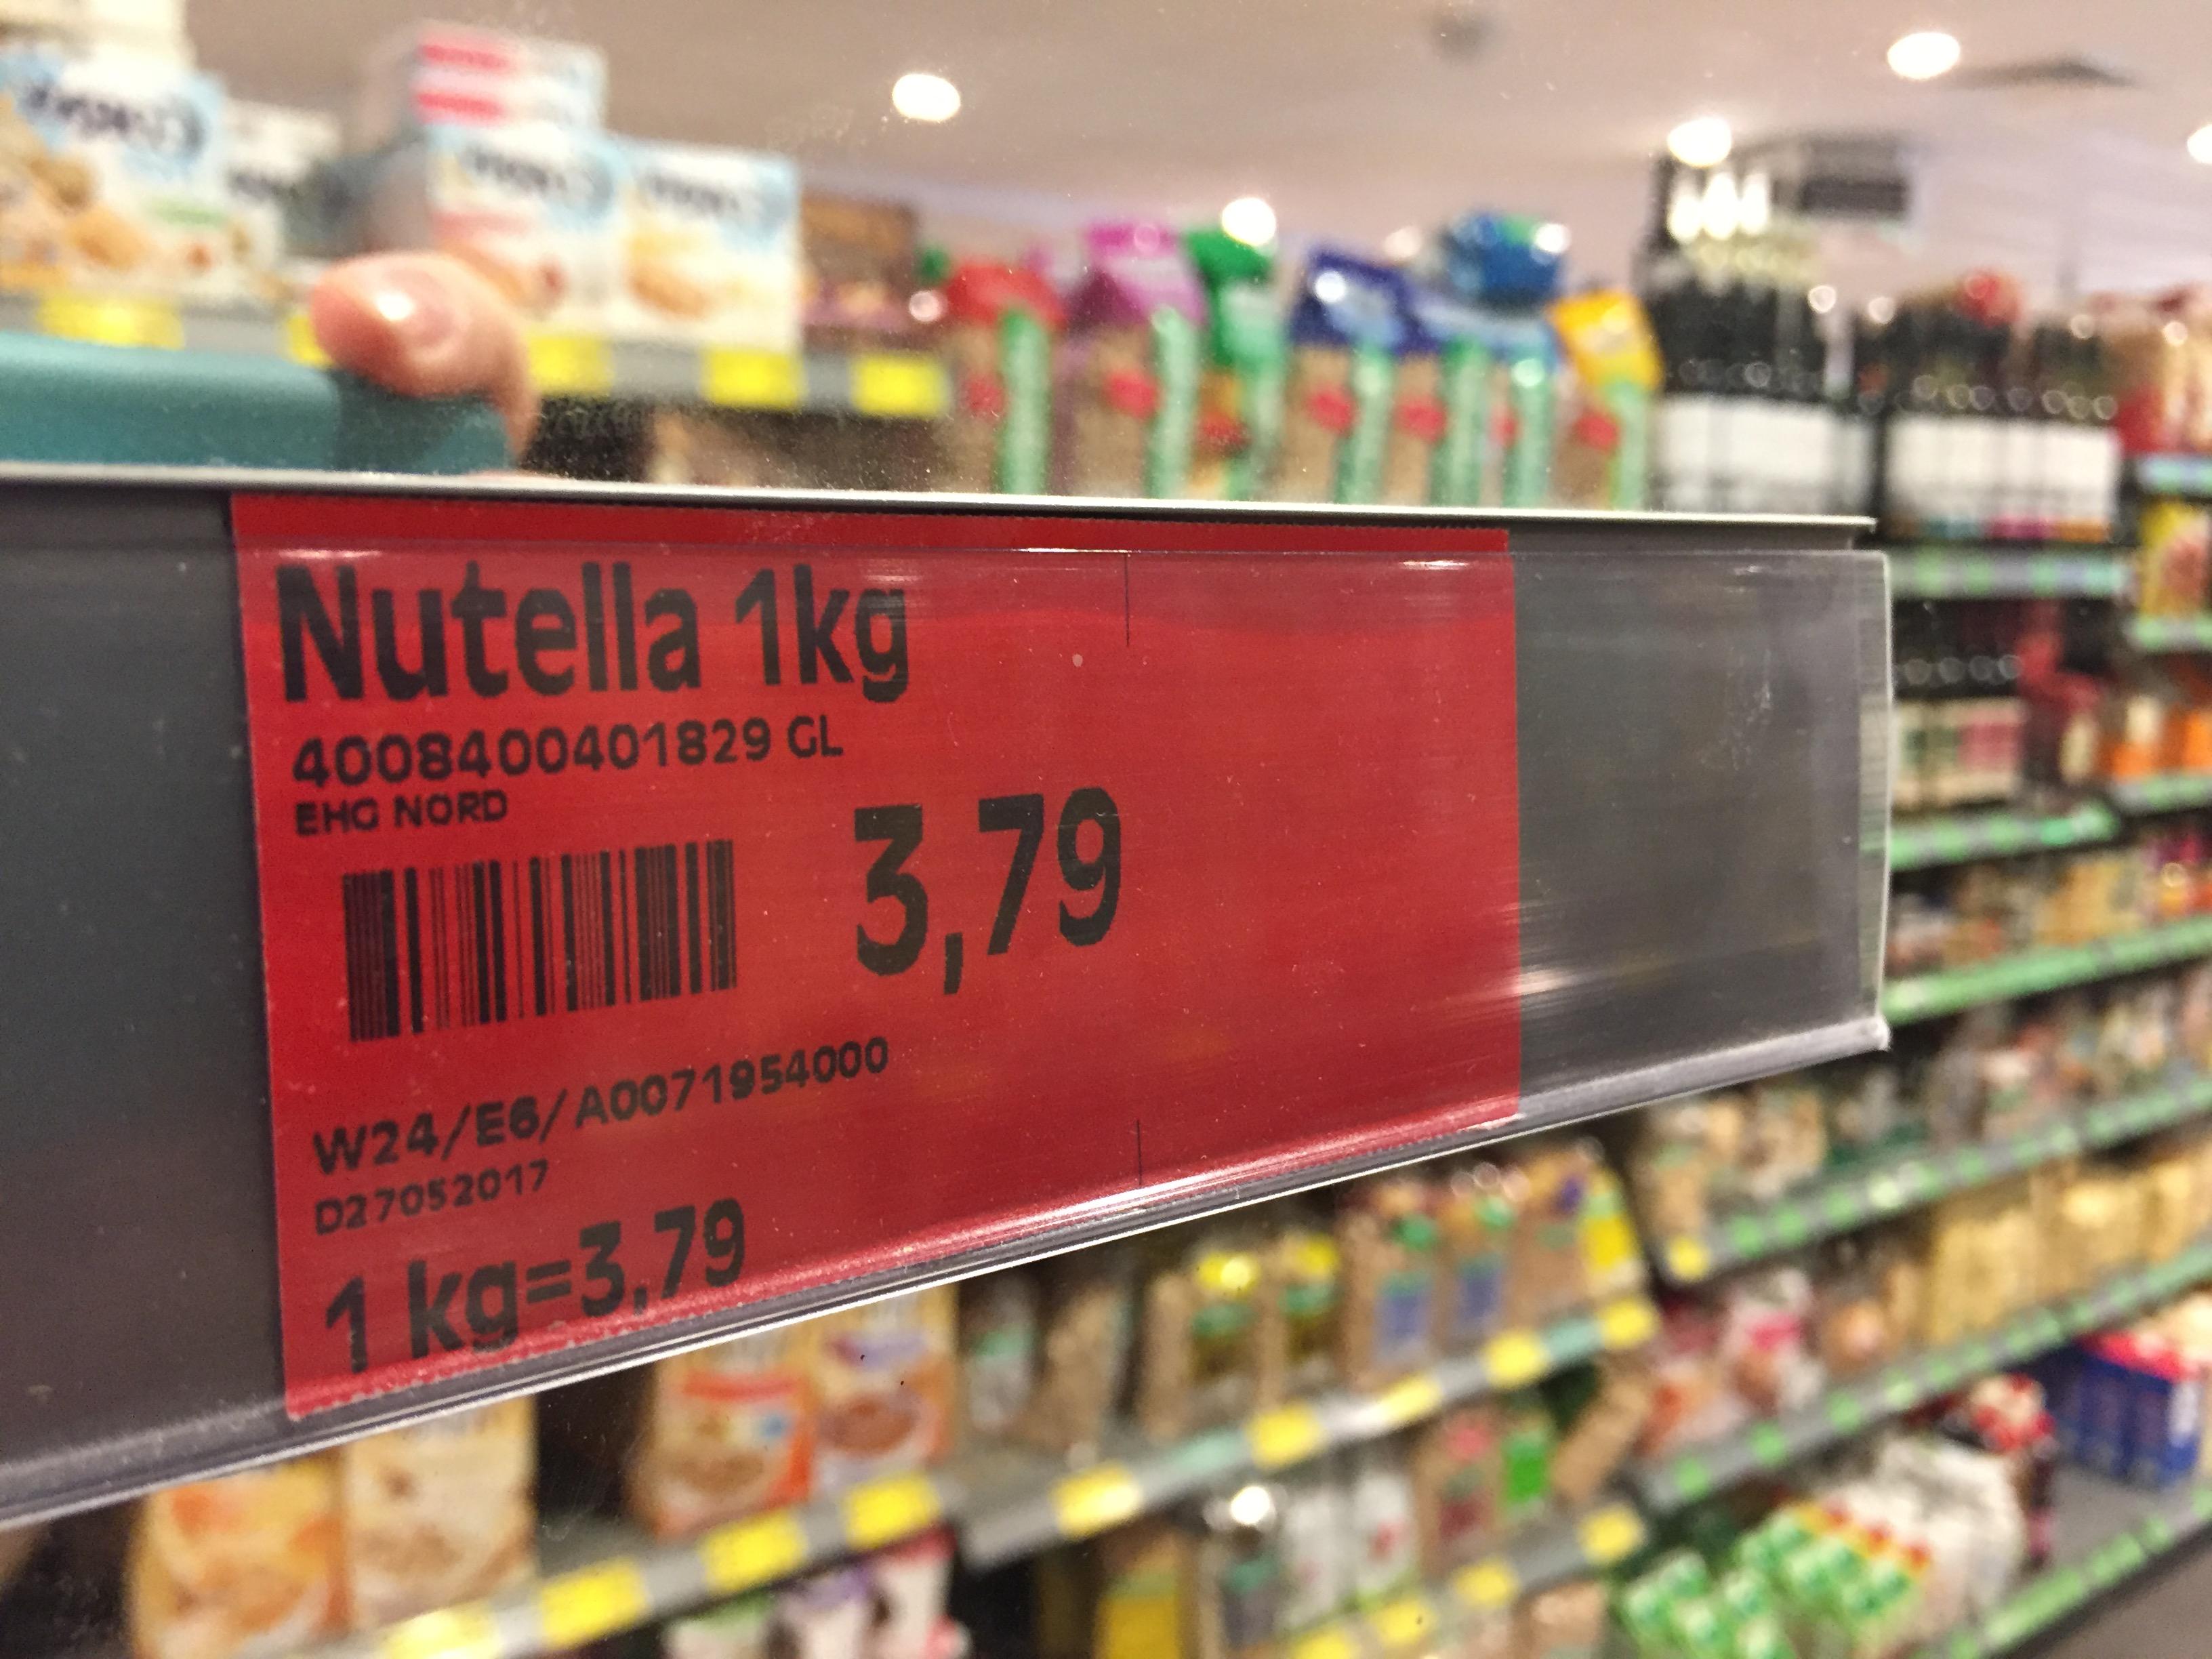 Nutella 1kg 3,79€ @Edeka (HH - Hagenbecks Tierpark) - Lokal?